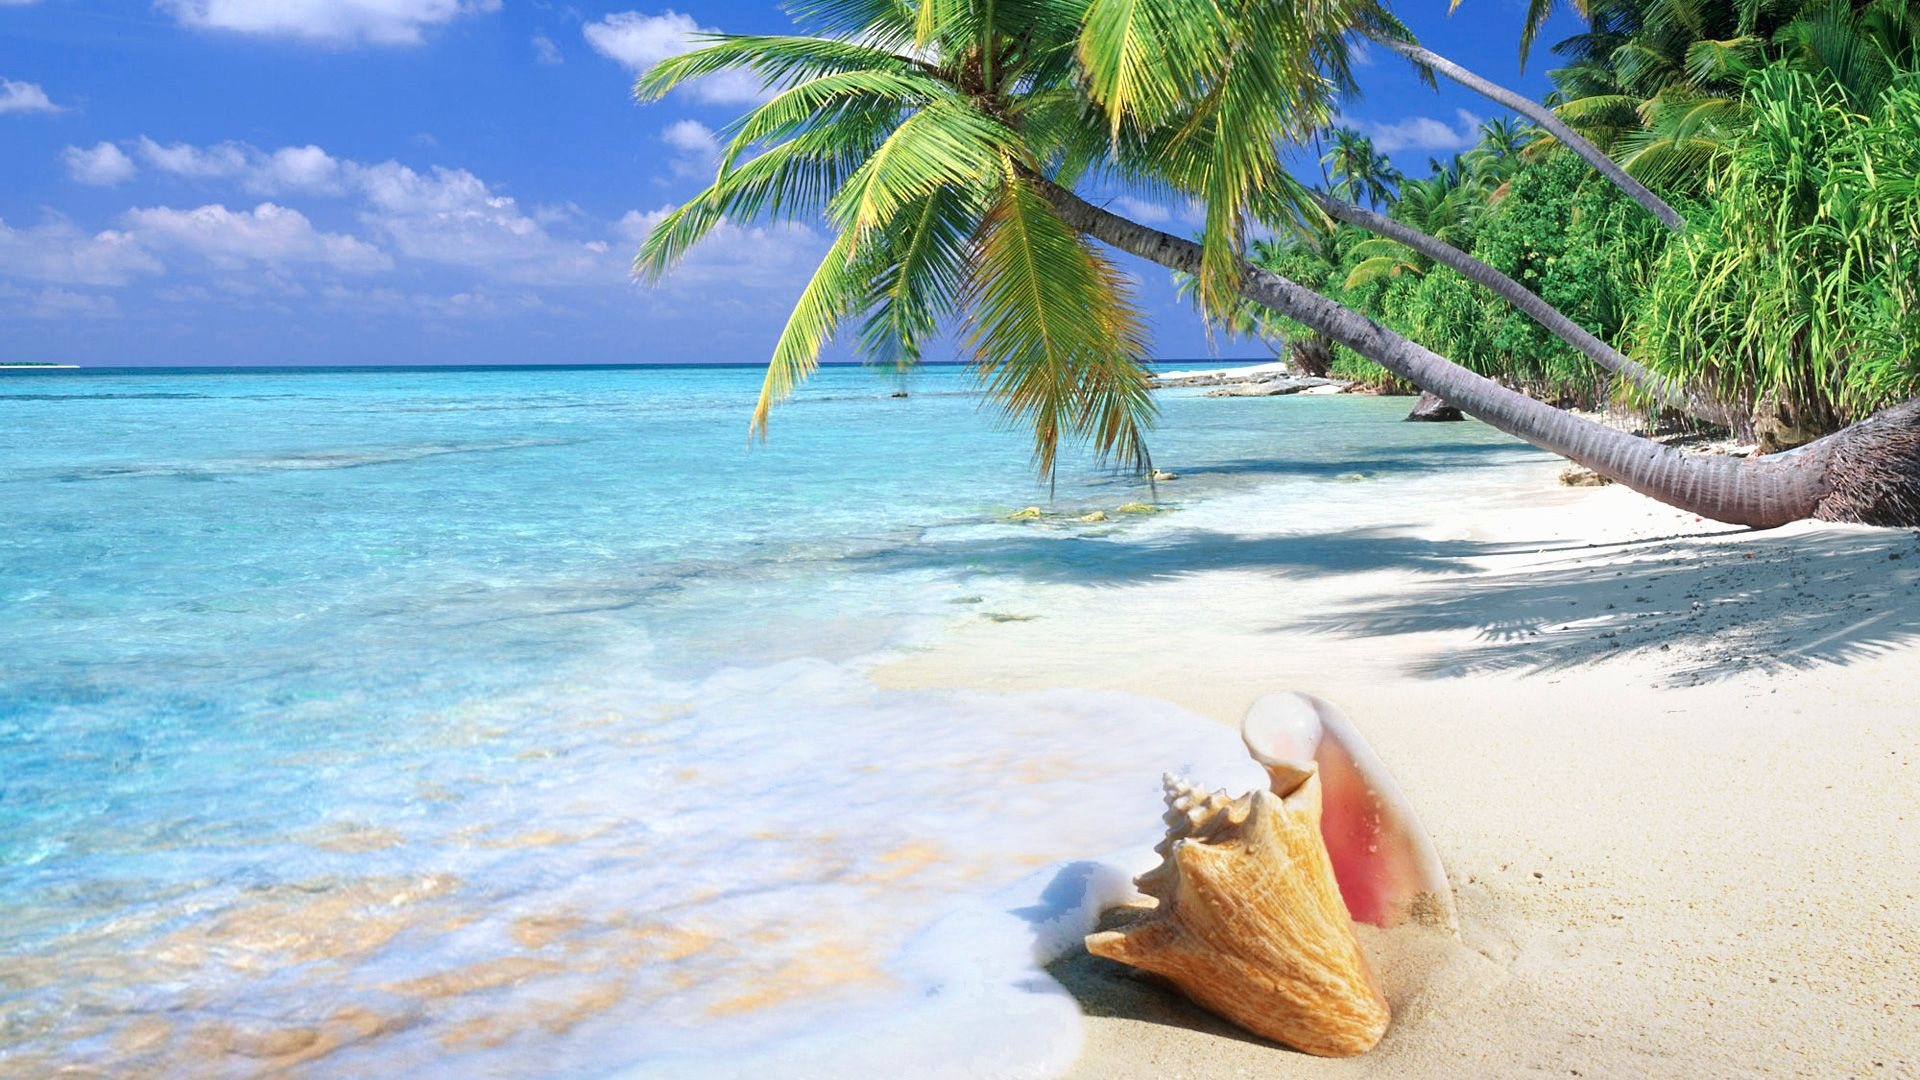 Desktop Background Tropical Hd Download Download Desktop Background Tropical Hd Download Desktop Background T Beach Scenery Beach Wallpaper Beach Pictures